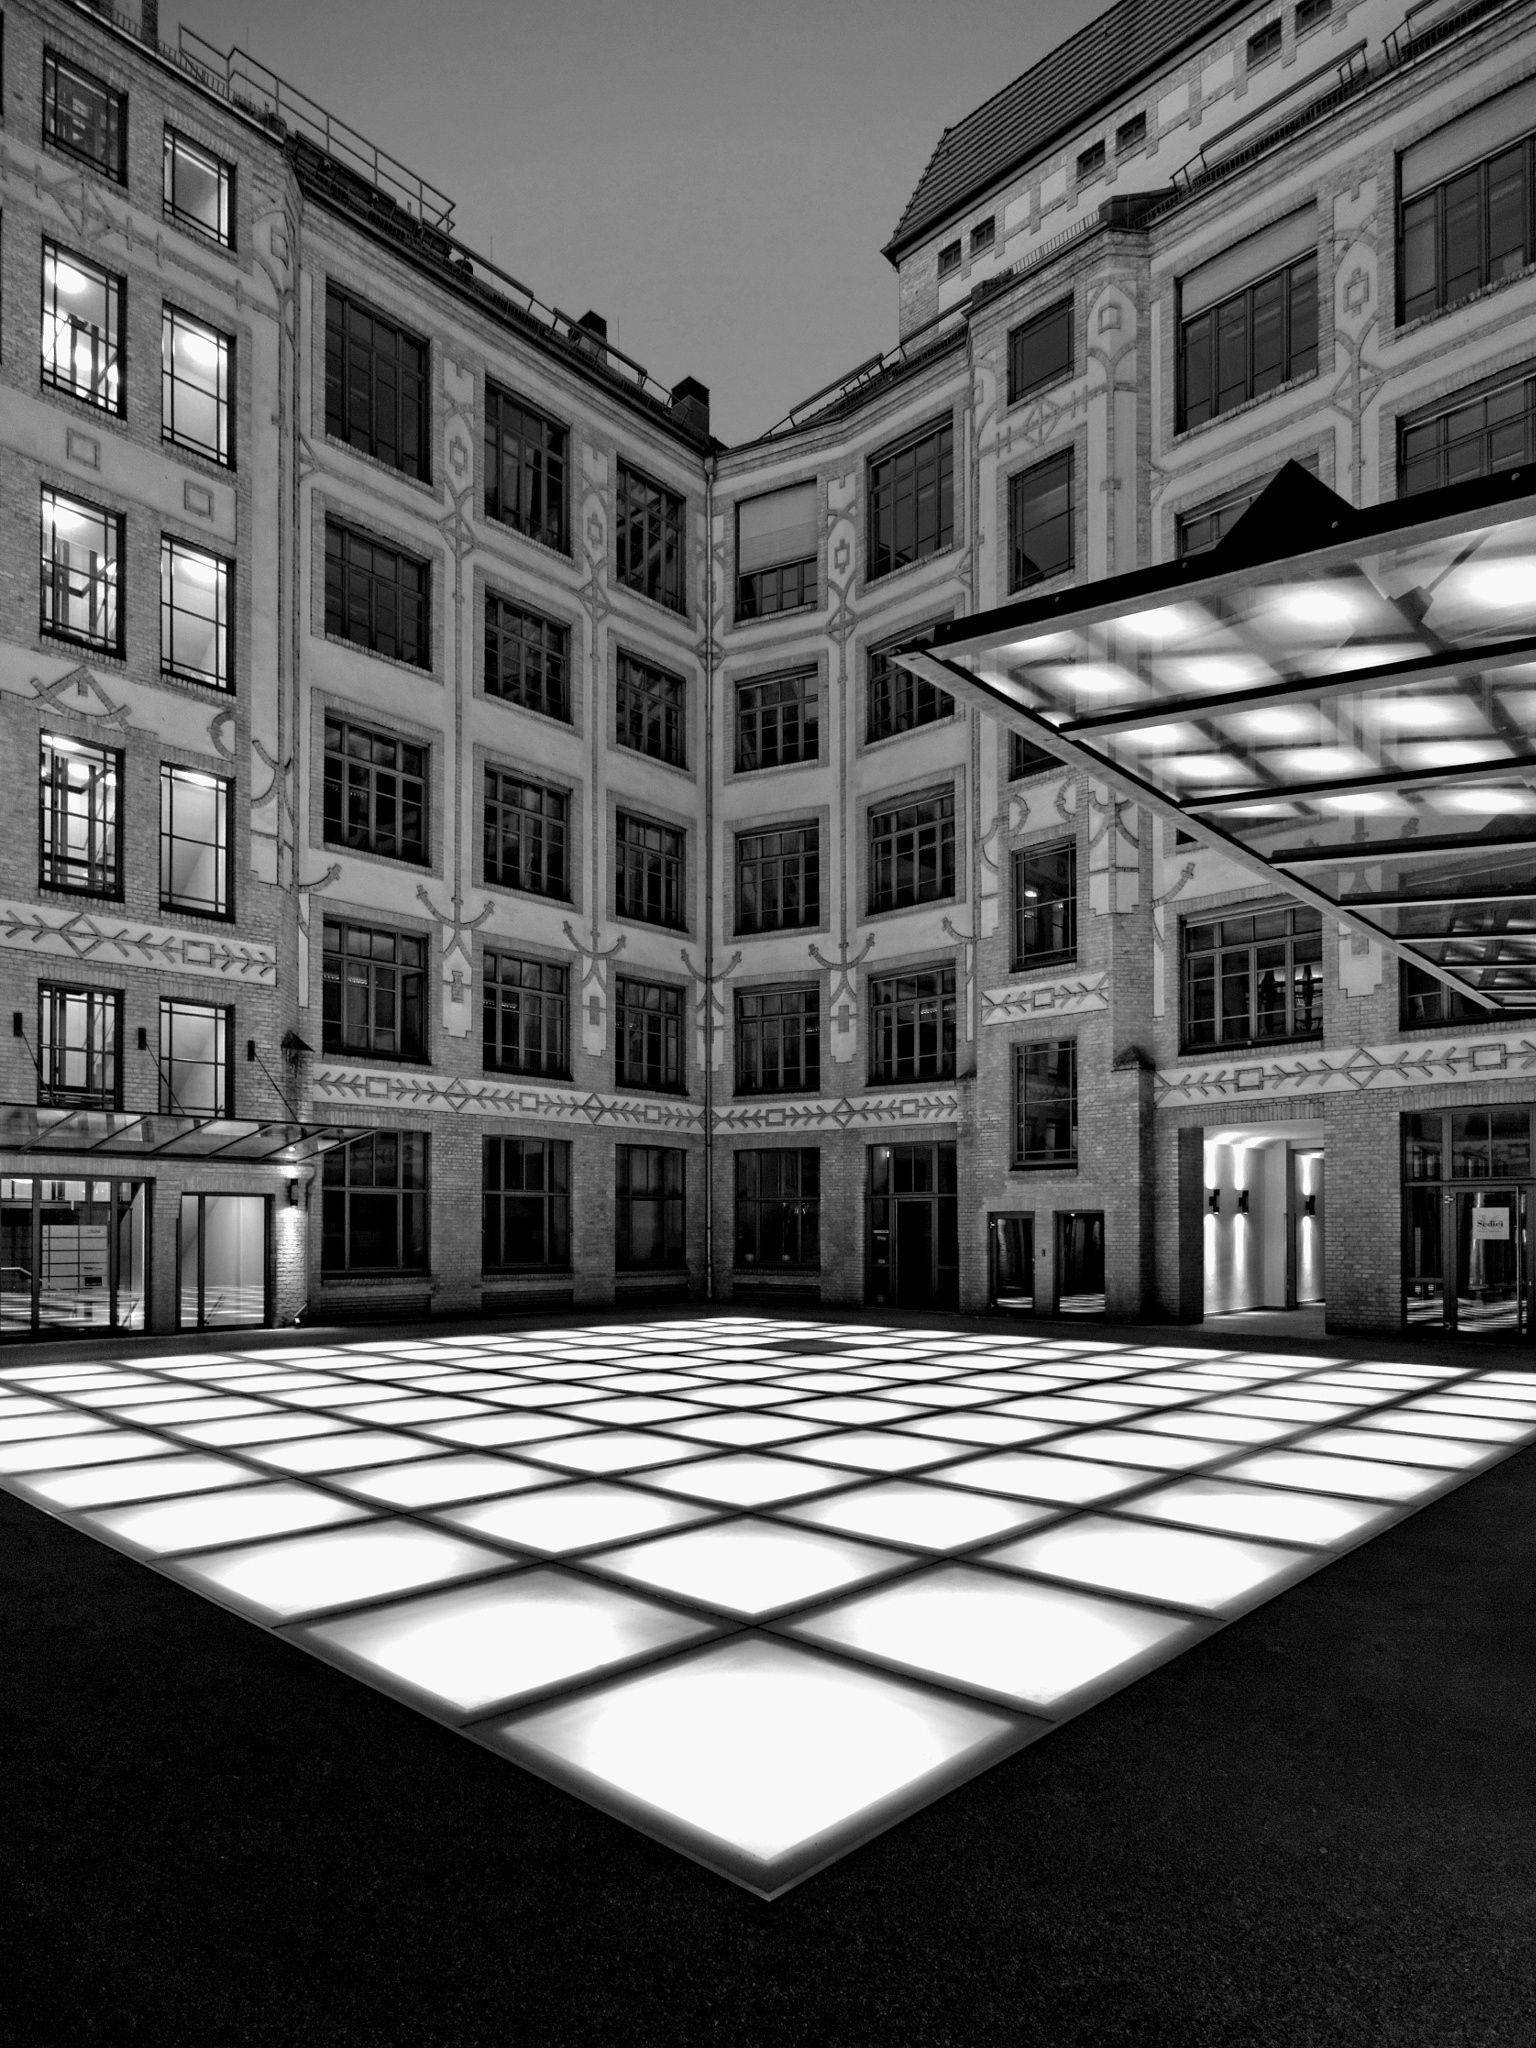 Hinterhof by Andreas Jeckstadt